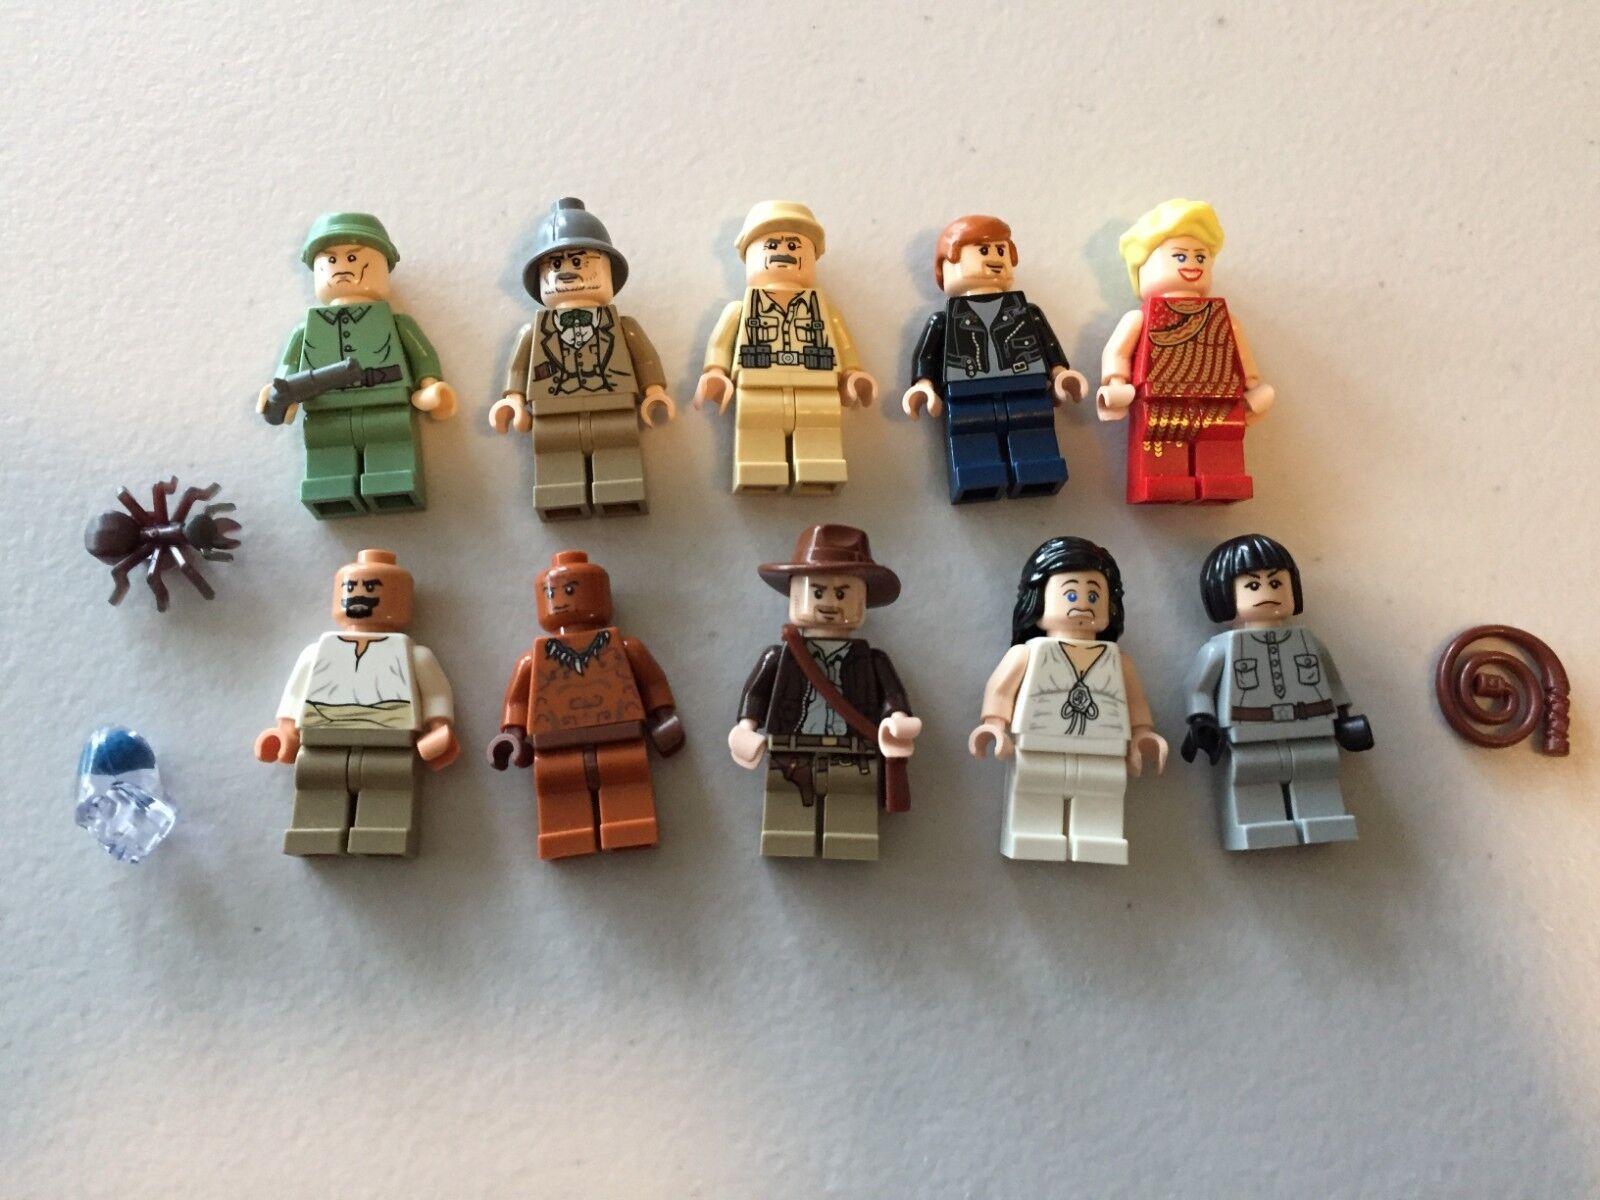 LEGO INDIANA JONES MINI FIGURE LOT OF 10 INDY Spinkova Marian s494B